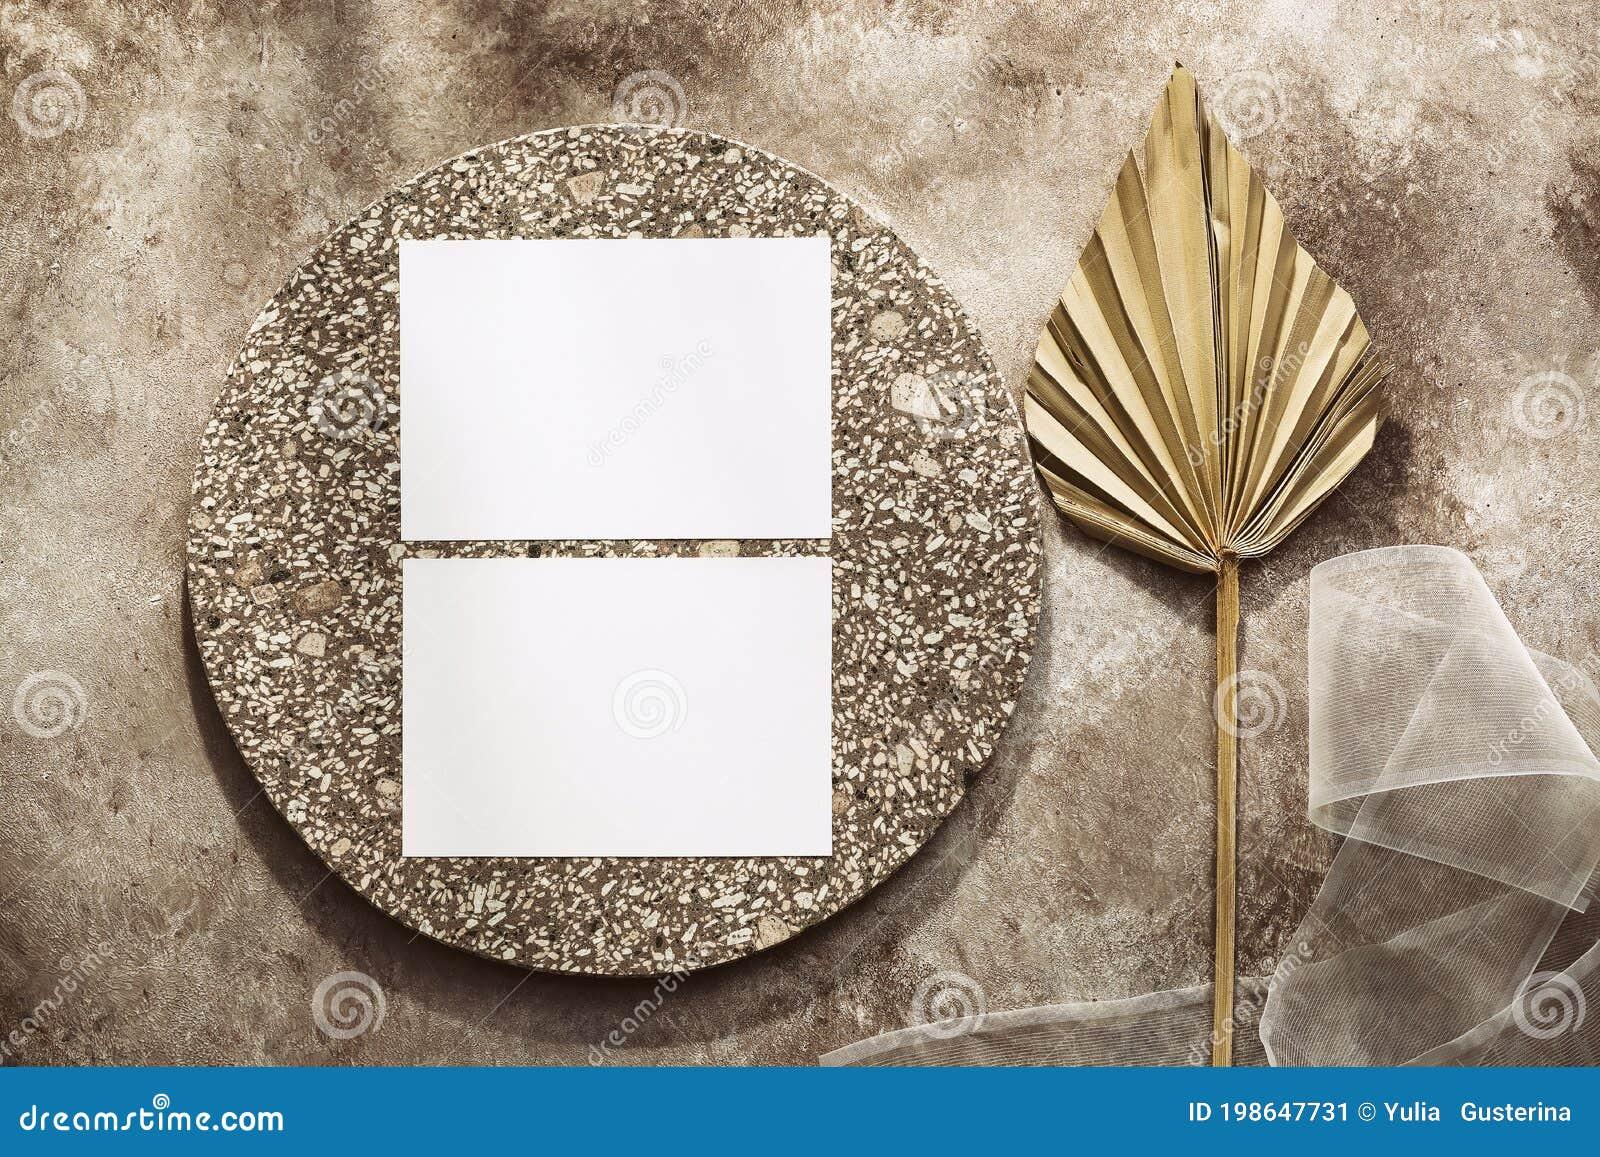 feminine wedding invitation card blank paper cards mockup